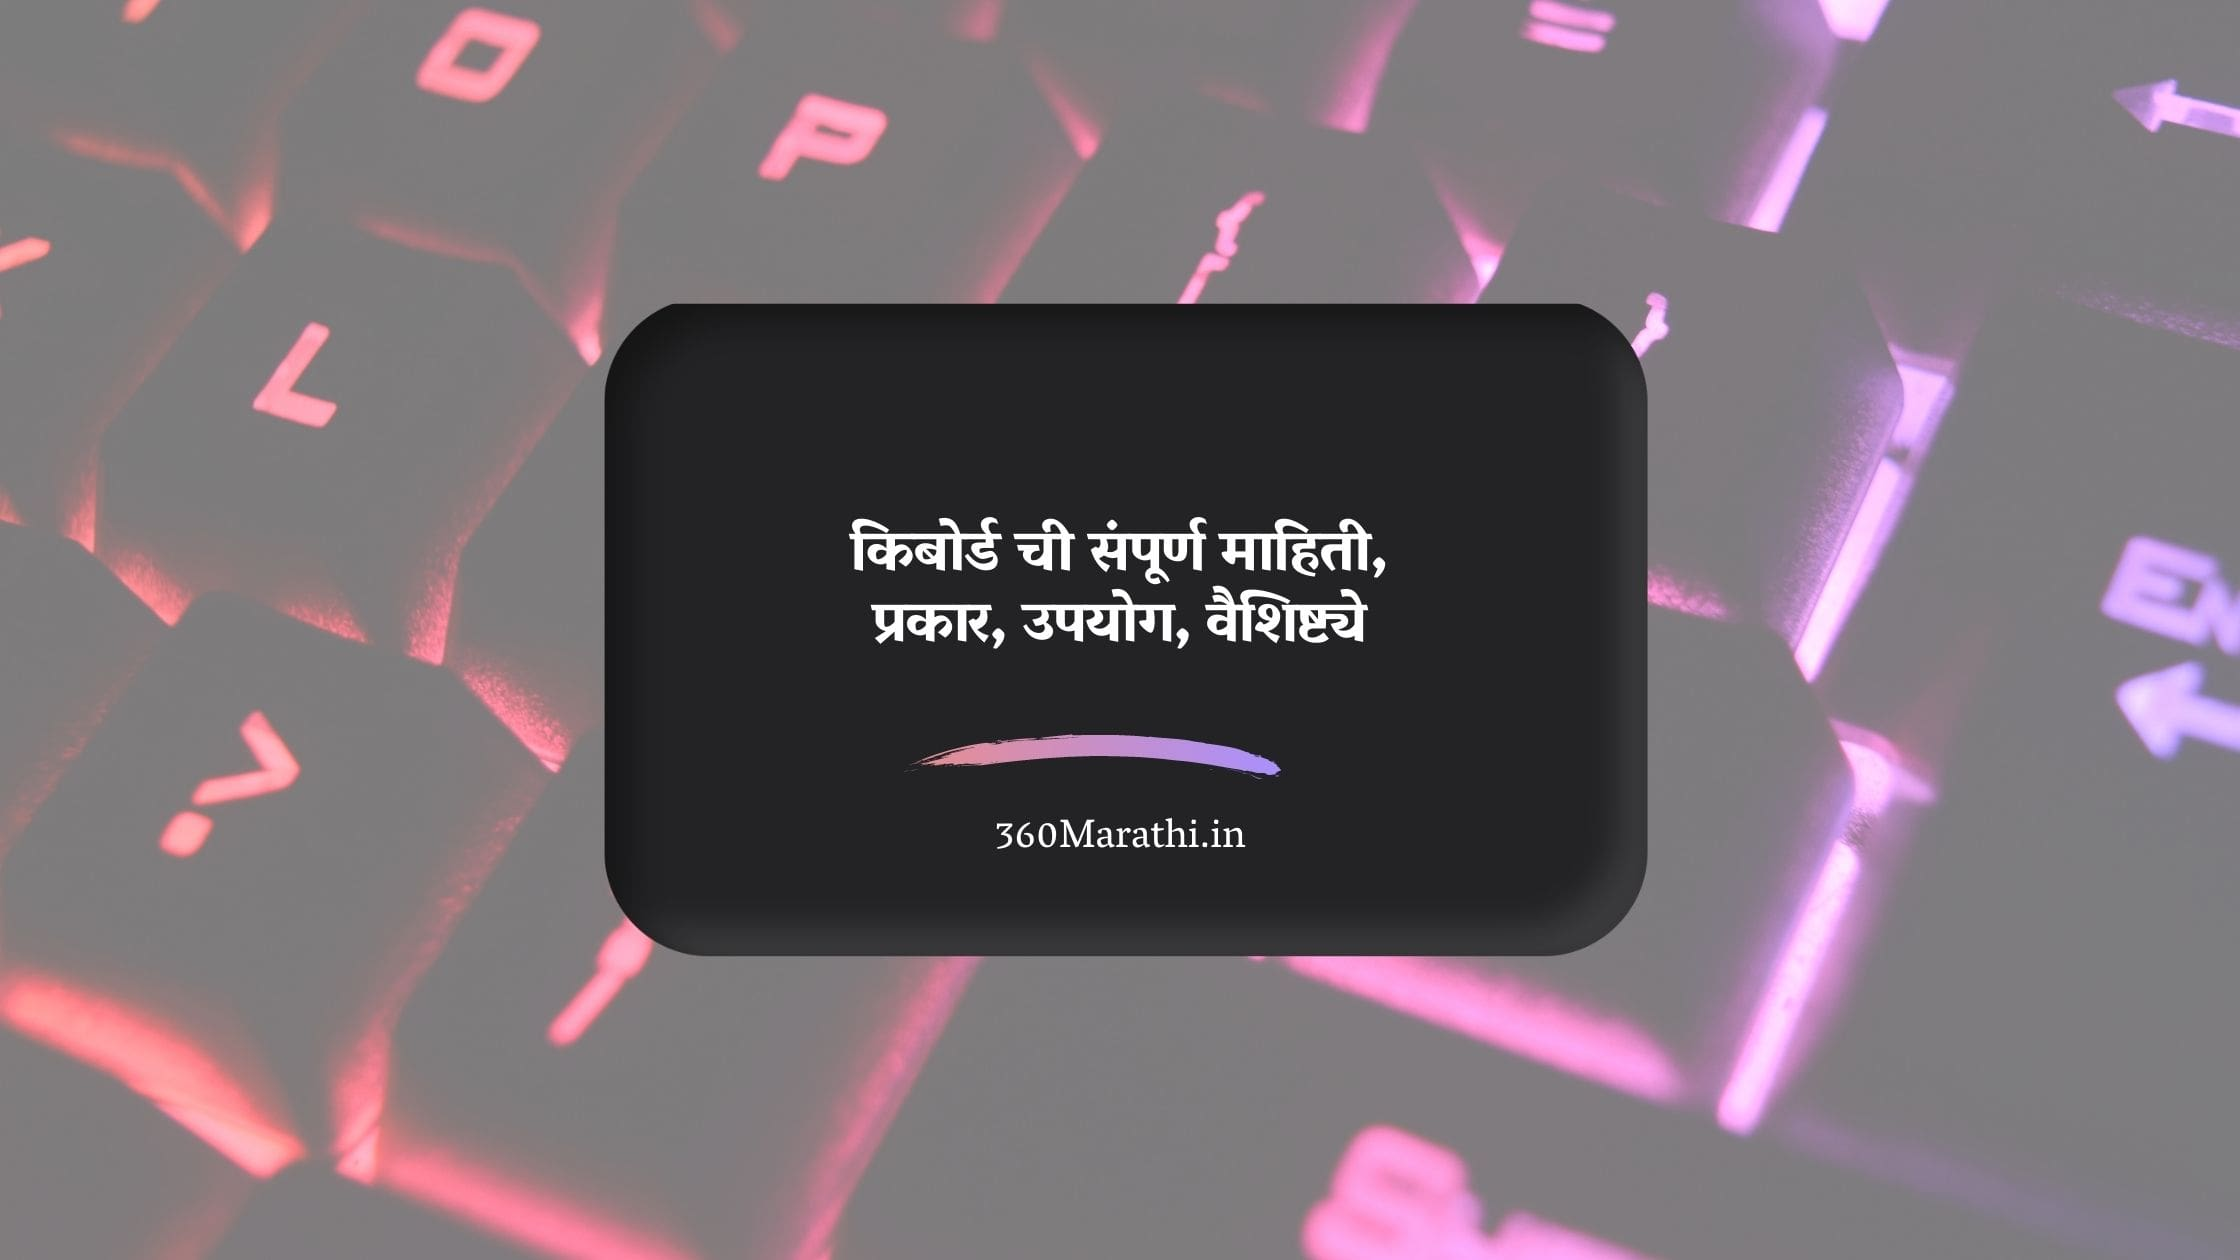 किबोर्ड ची संपूर्ण माहिती, प्रकार, उपयोग, वैशिष्ट्ये -Keyboard Information In Marathi, Types, Uses